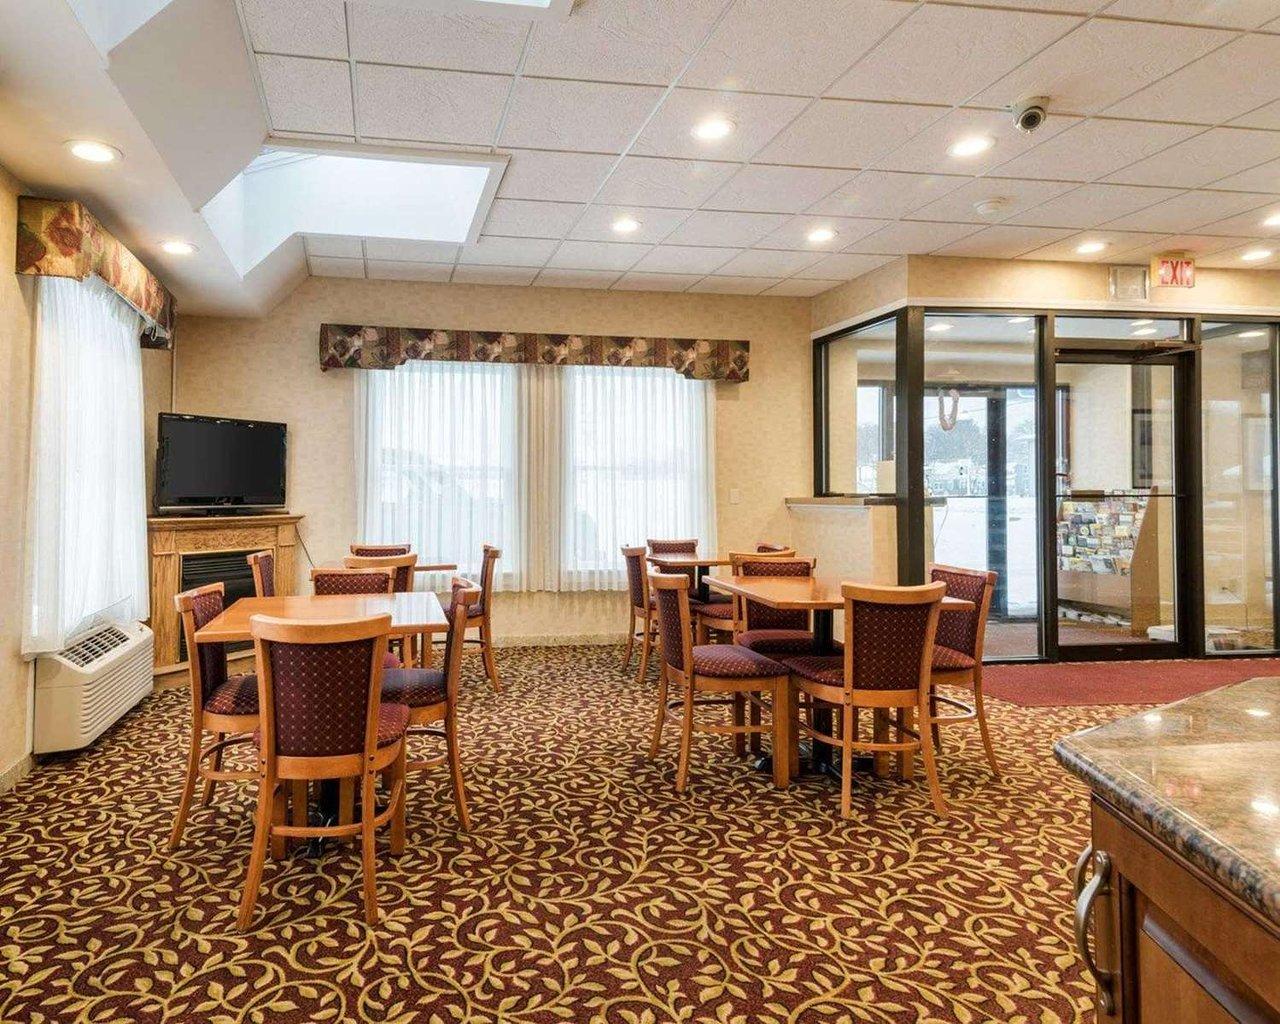 rodeway inn prices motel reviews weedsport ny tripadvisor rh tripadvisor com